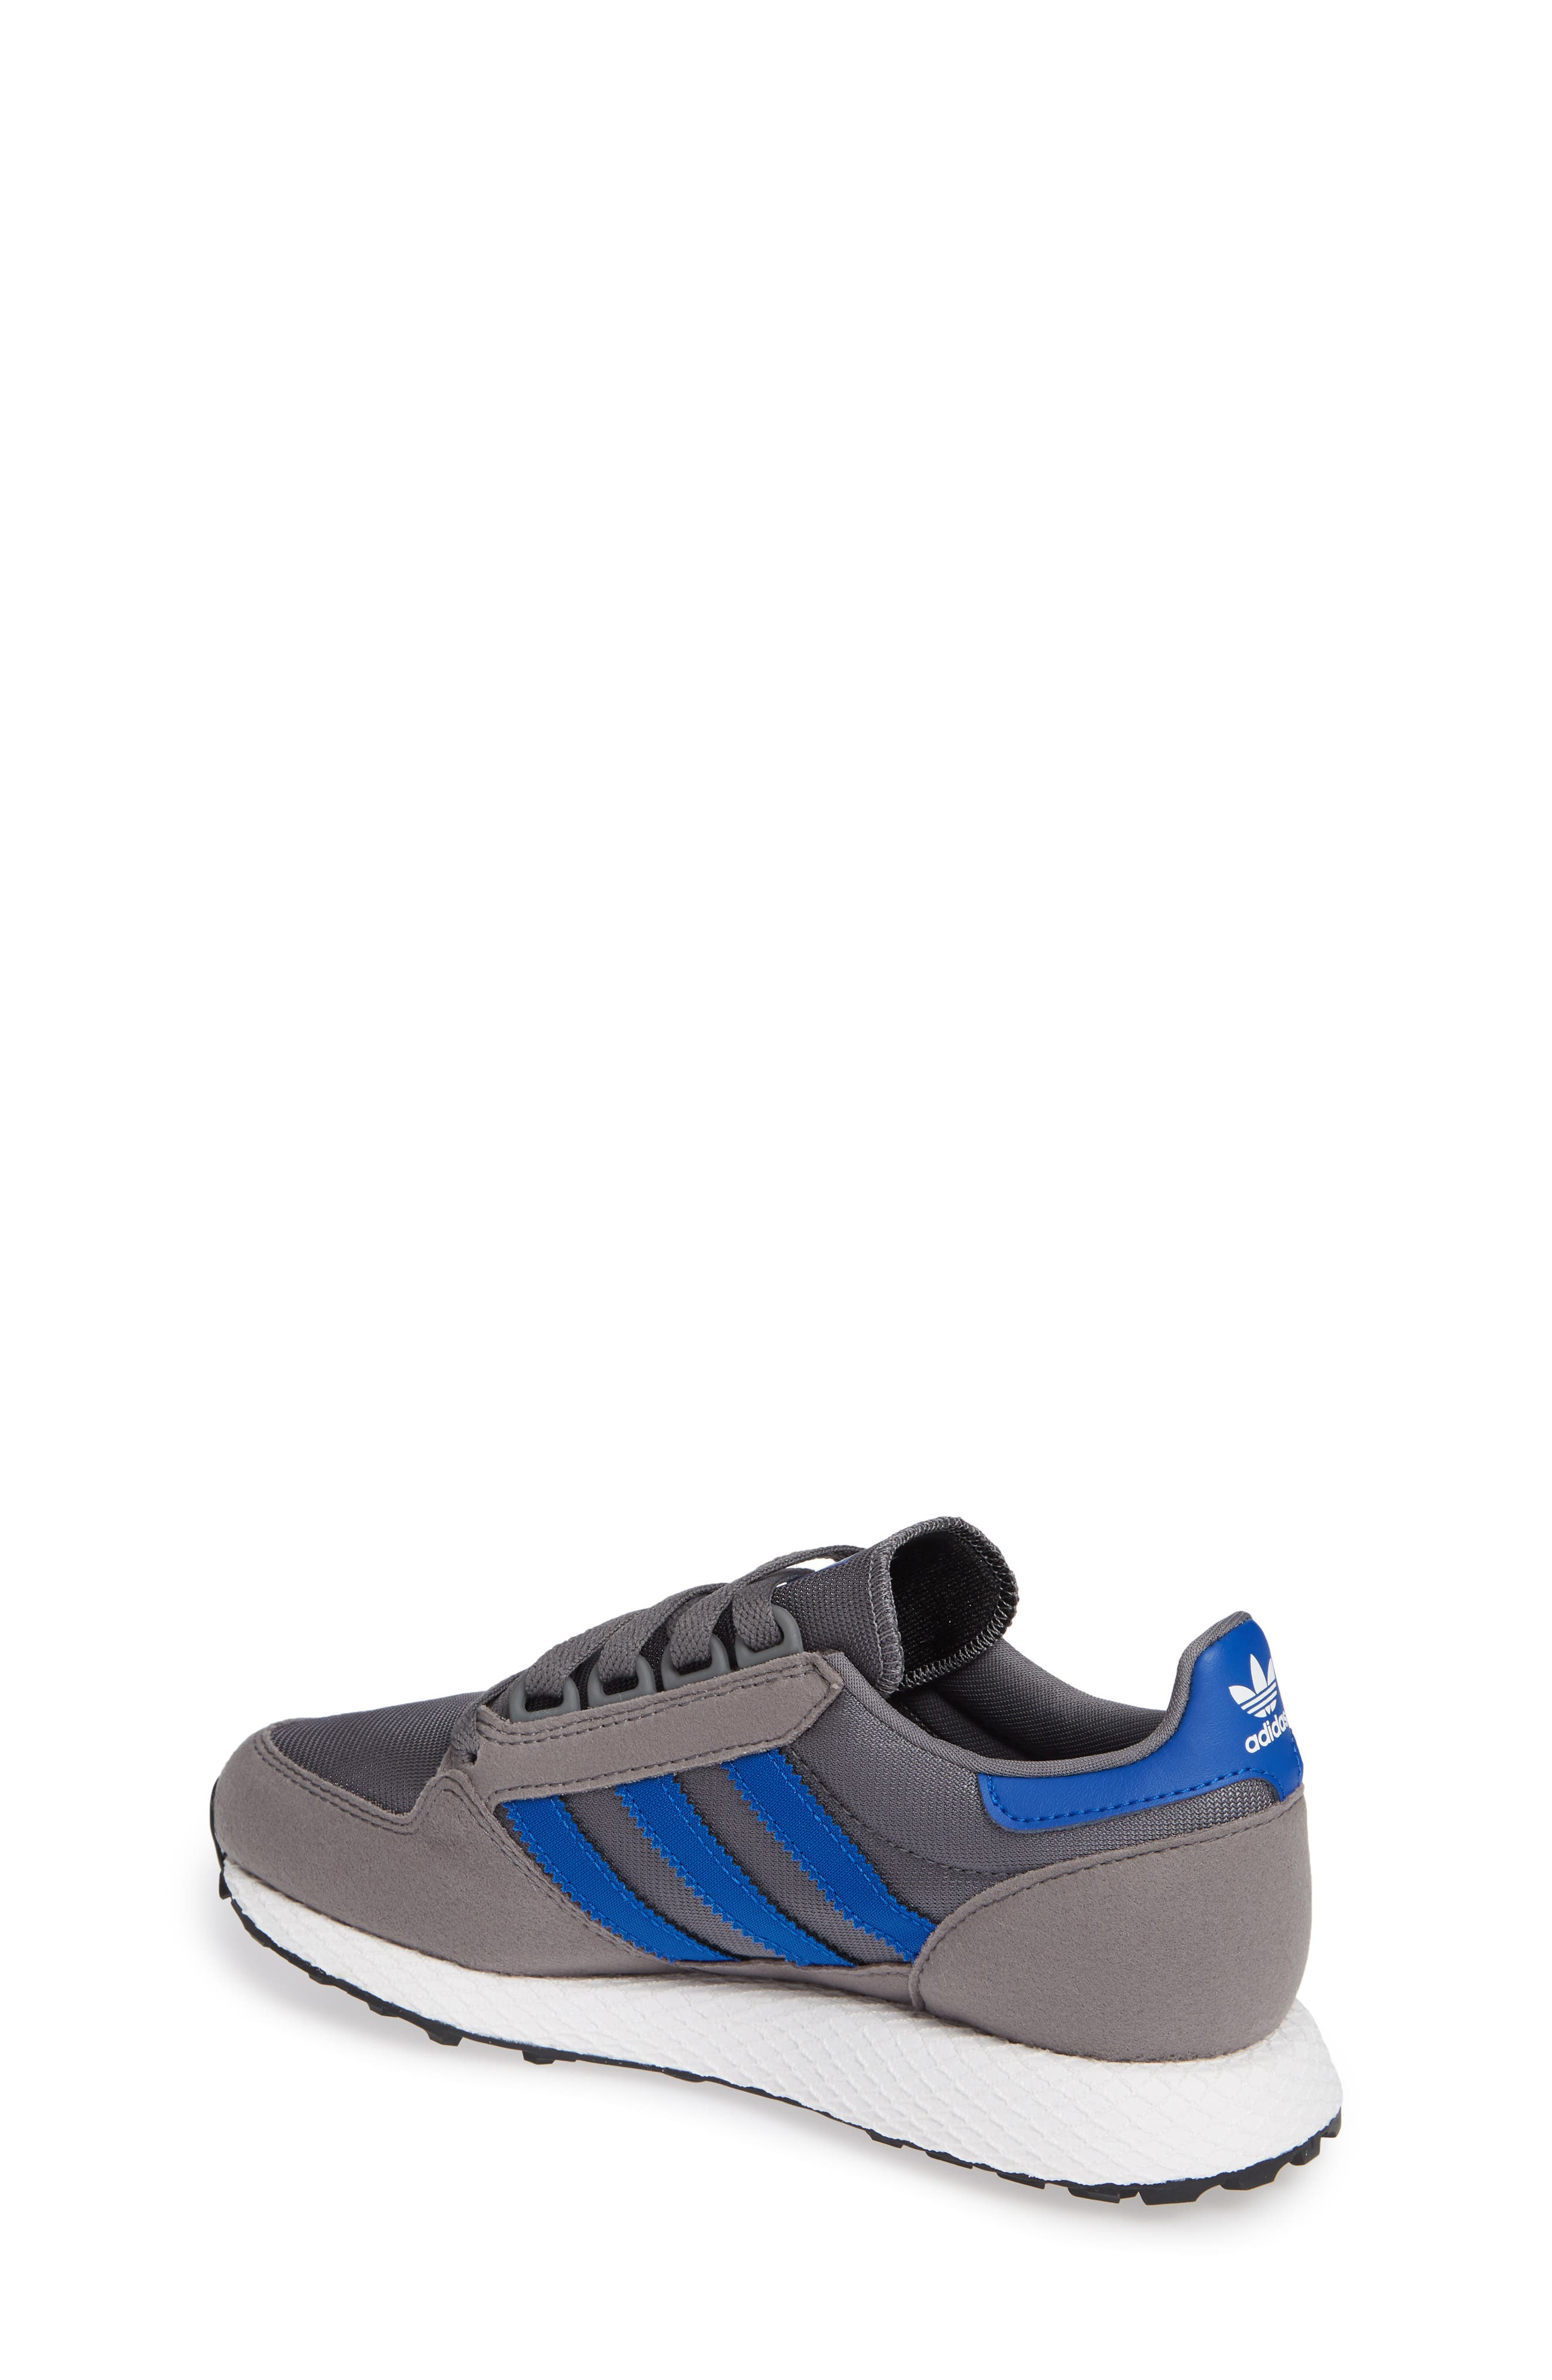 Forest Grove Sneaker,                             Alternate thumbnail 2, color,                             GREY/ COLLEGIATE ROYAL/ WHITE